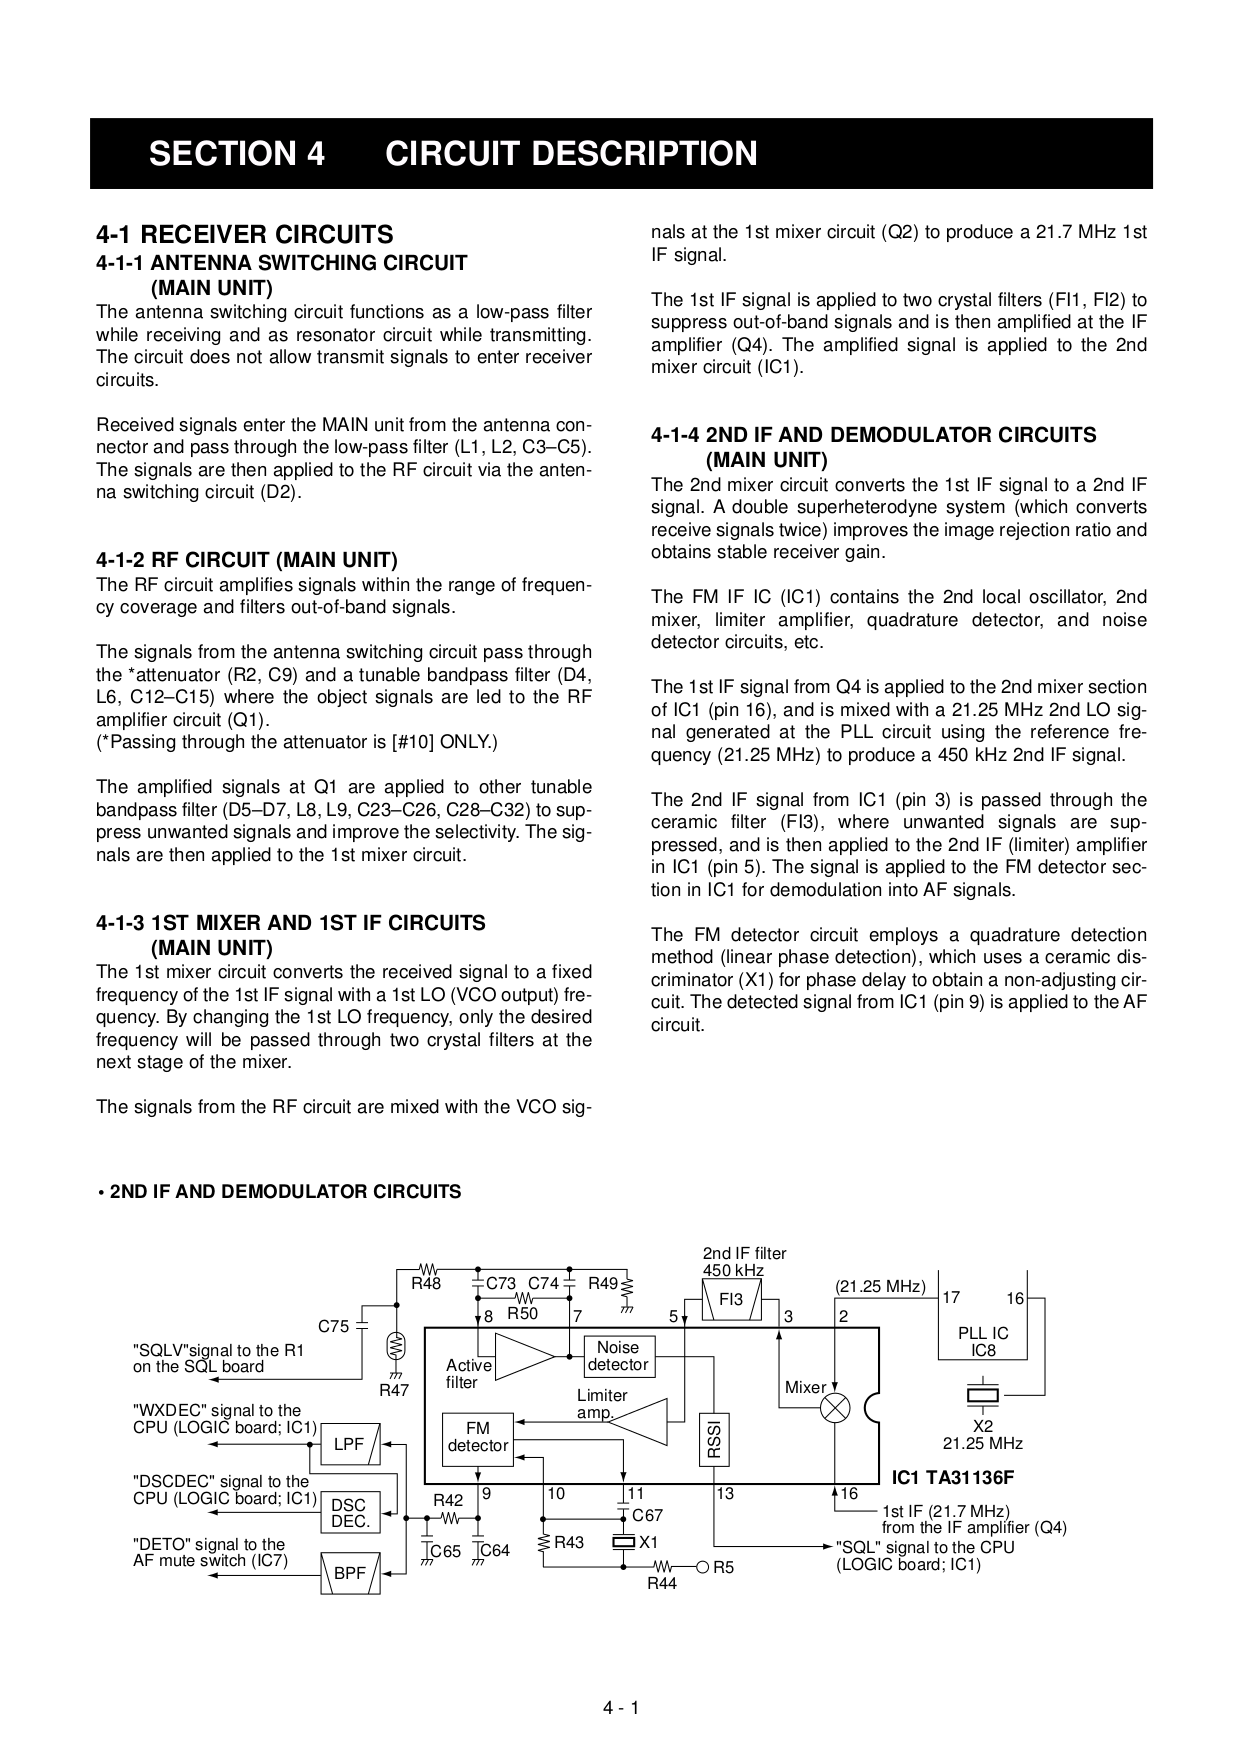 Pdf Manual For Icom Other Ic M302 Radio Marine Antenna Switch Circuit